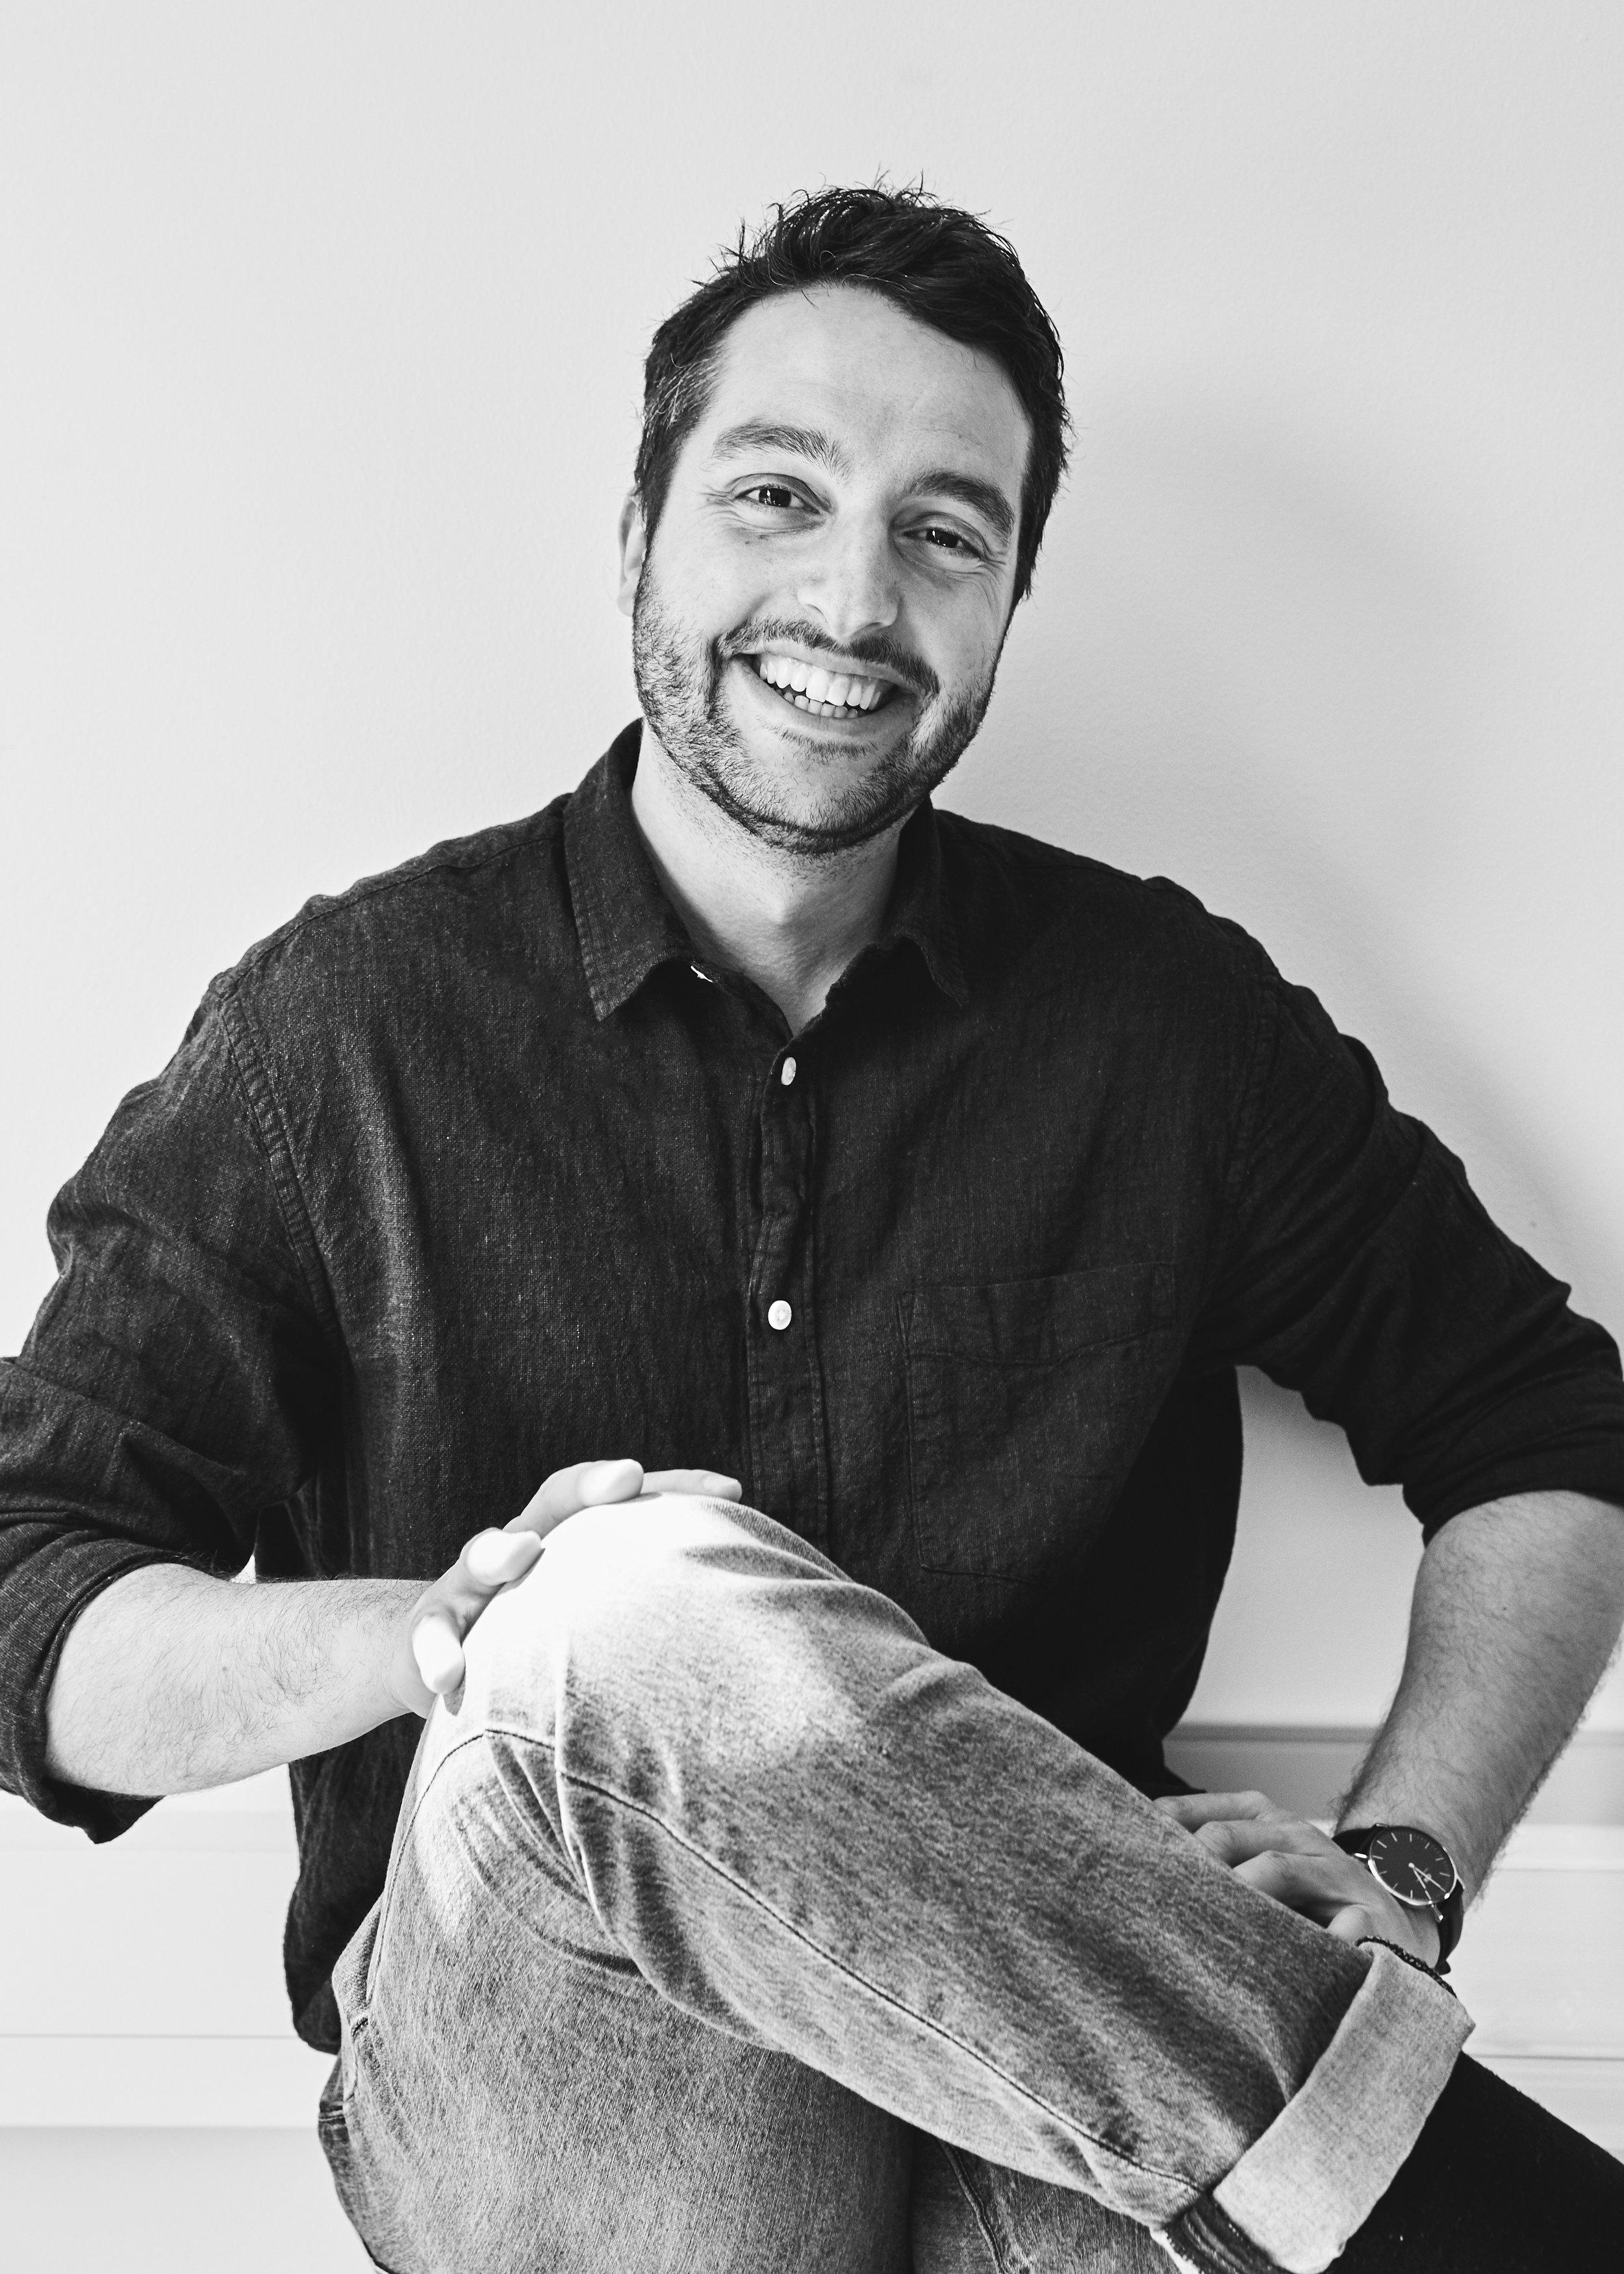 Fabio-Mayor-Portrait-by-aitor-santome